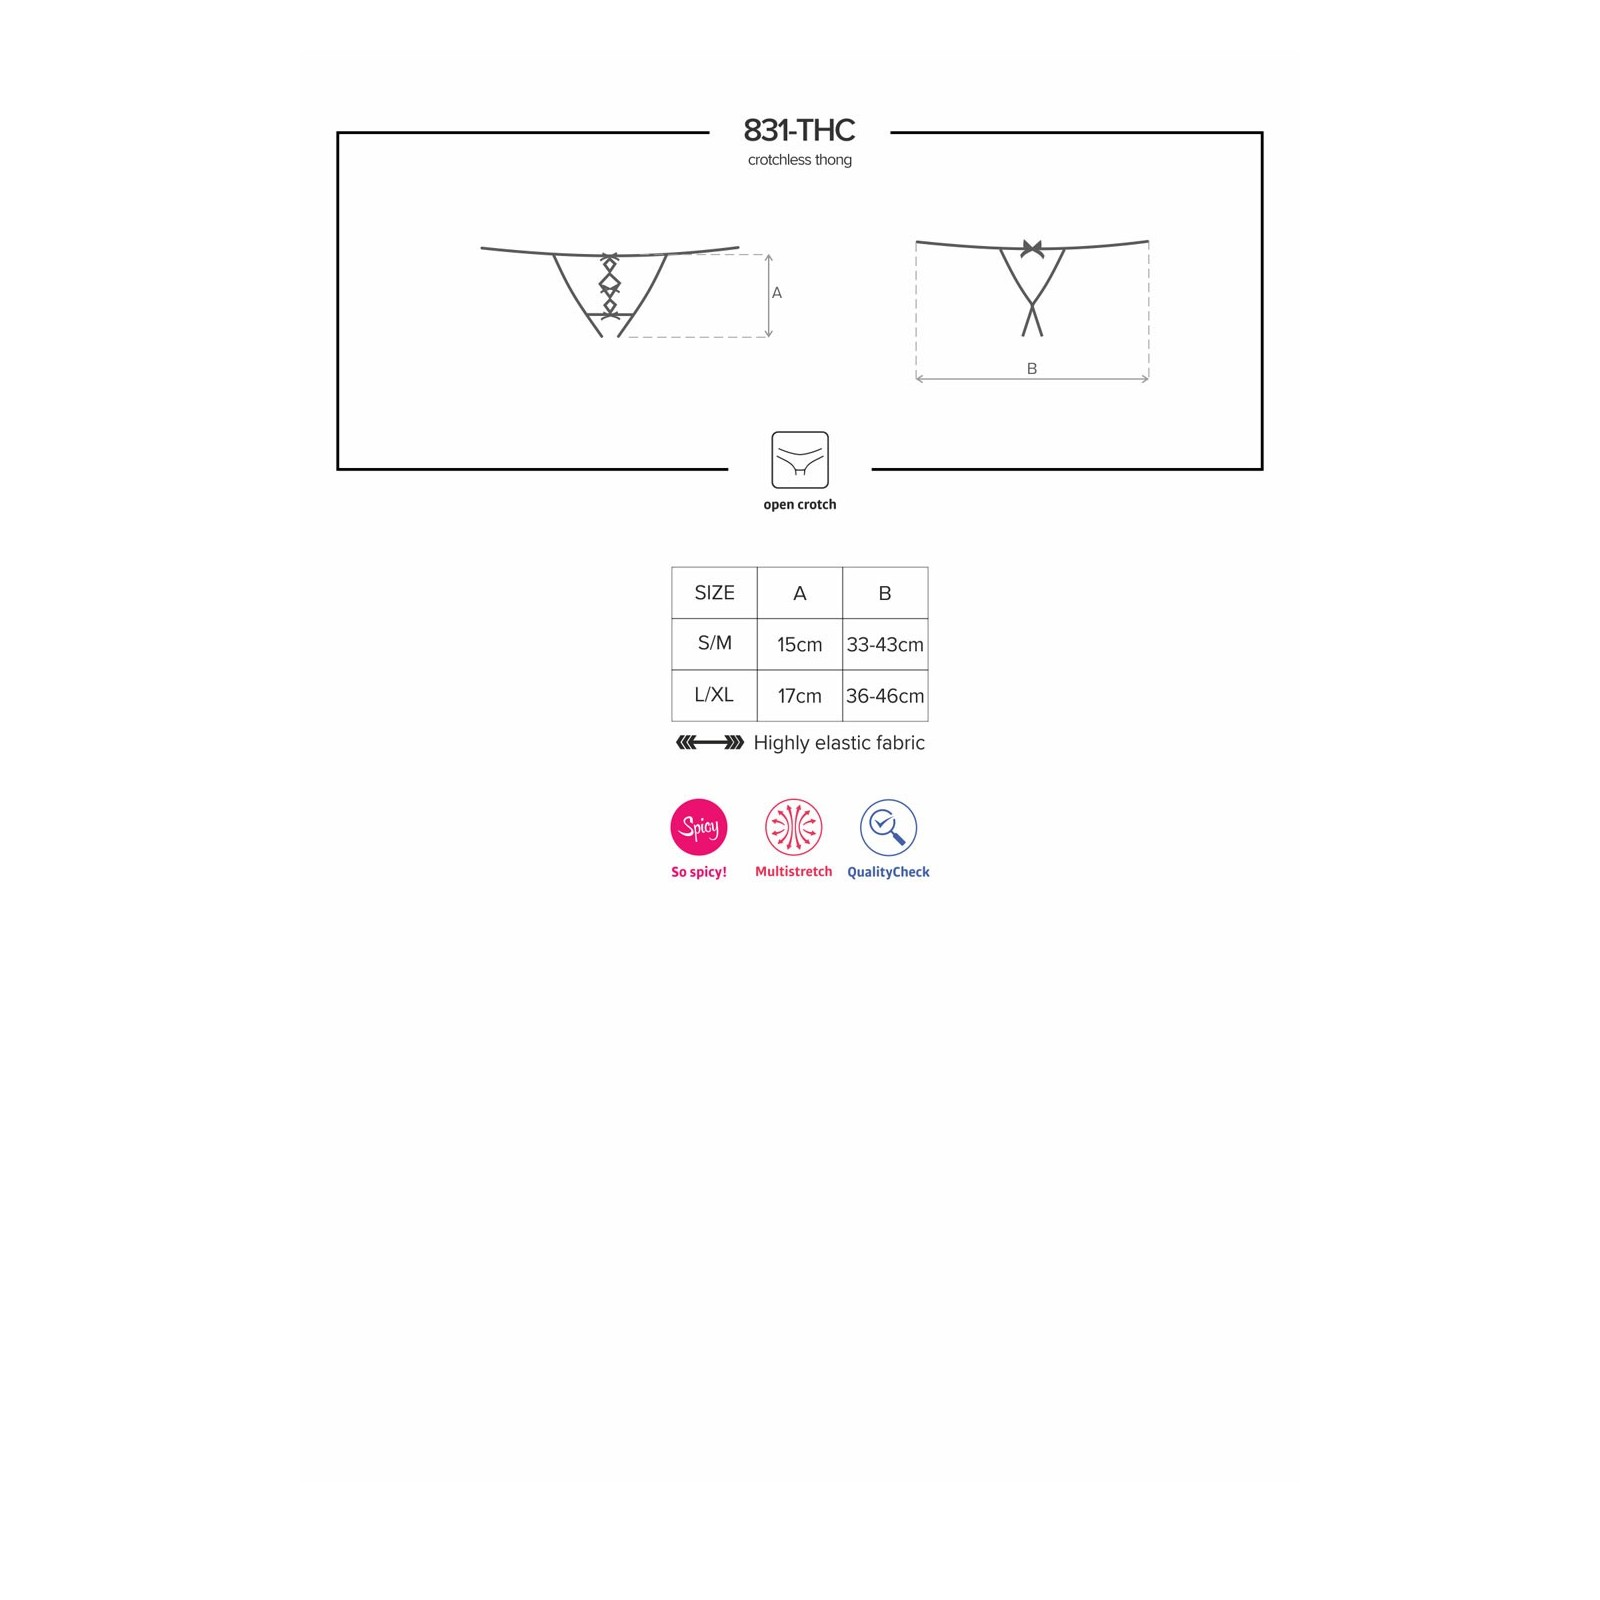 831-THC-1 Crotchless Thong - 9 - Vorschaubild